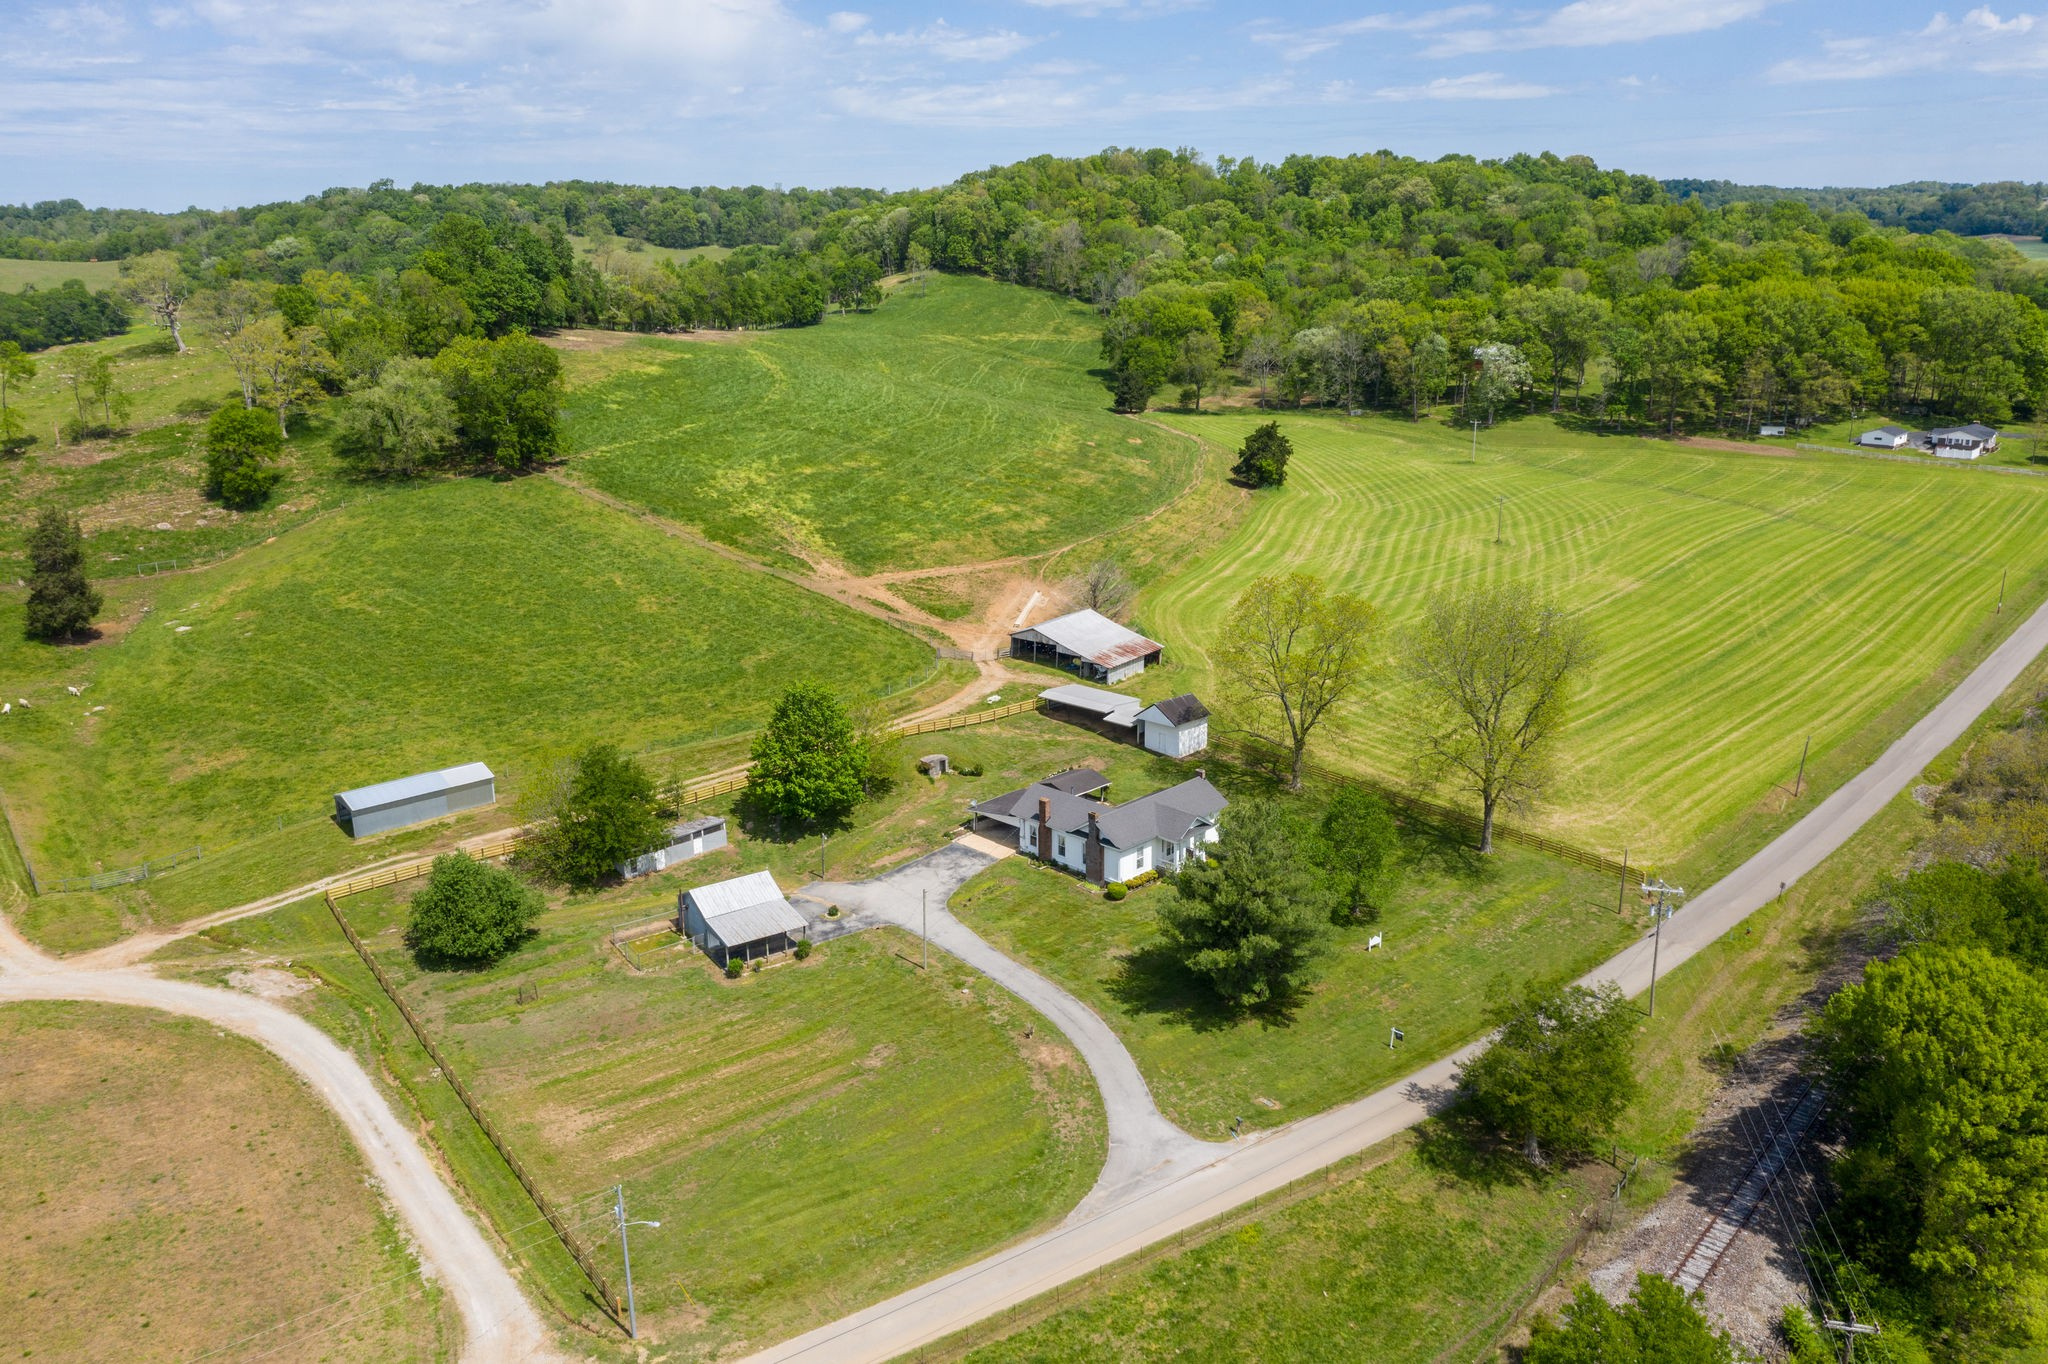 769 Dodson Gap Rd, Lynnville, TN 38472 - Lynnville, TN real estate listing